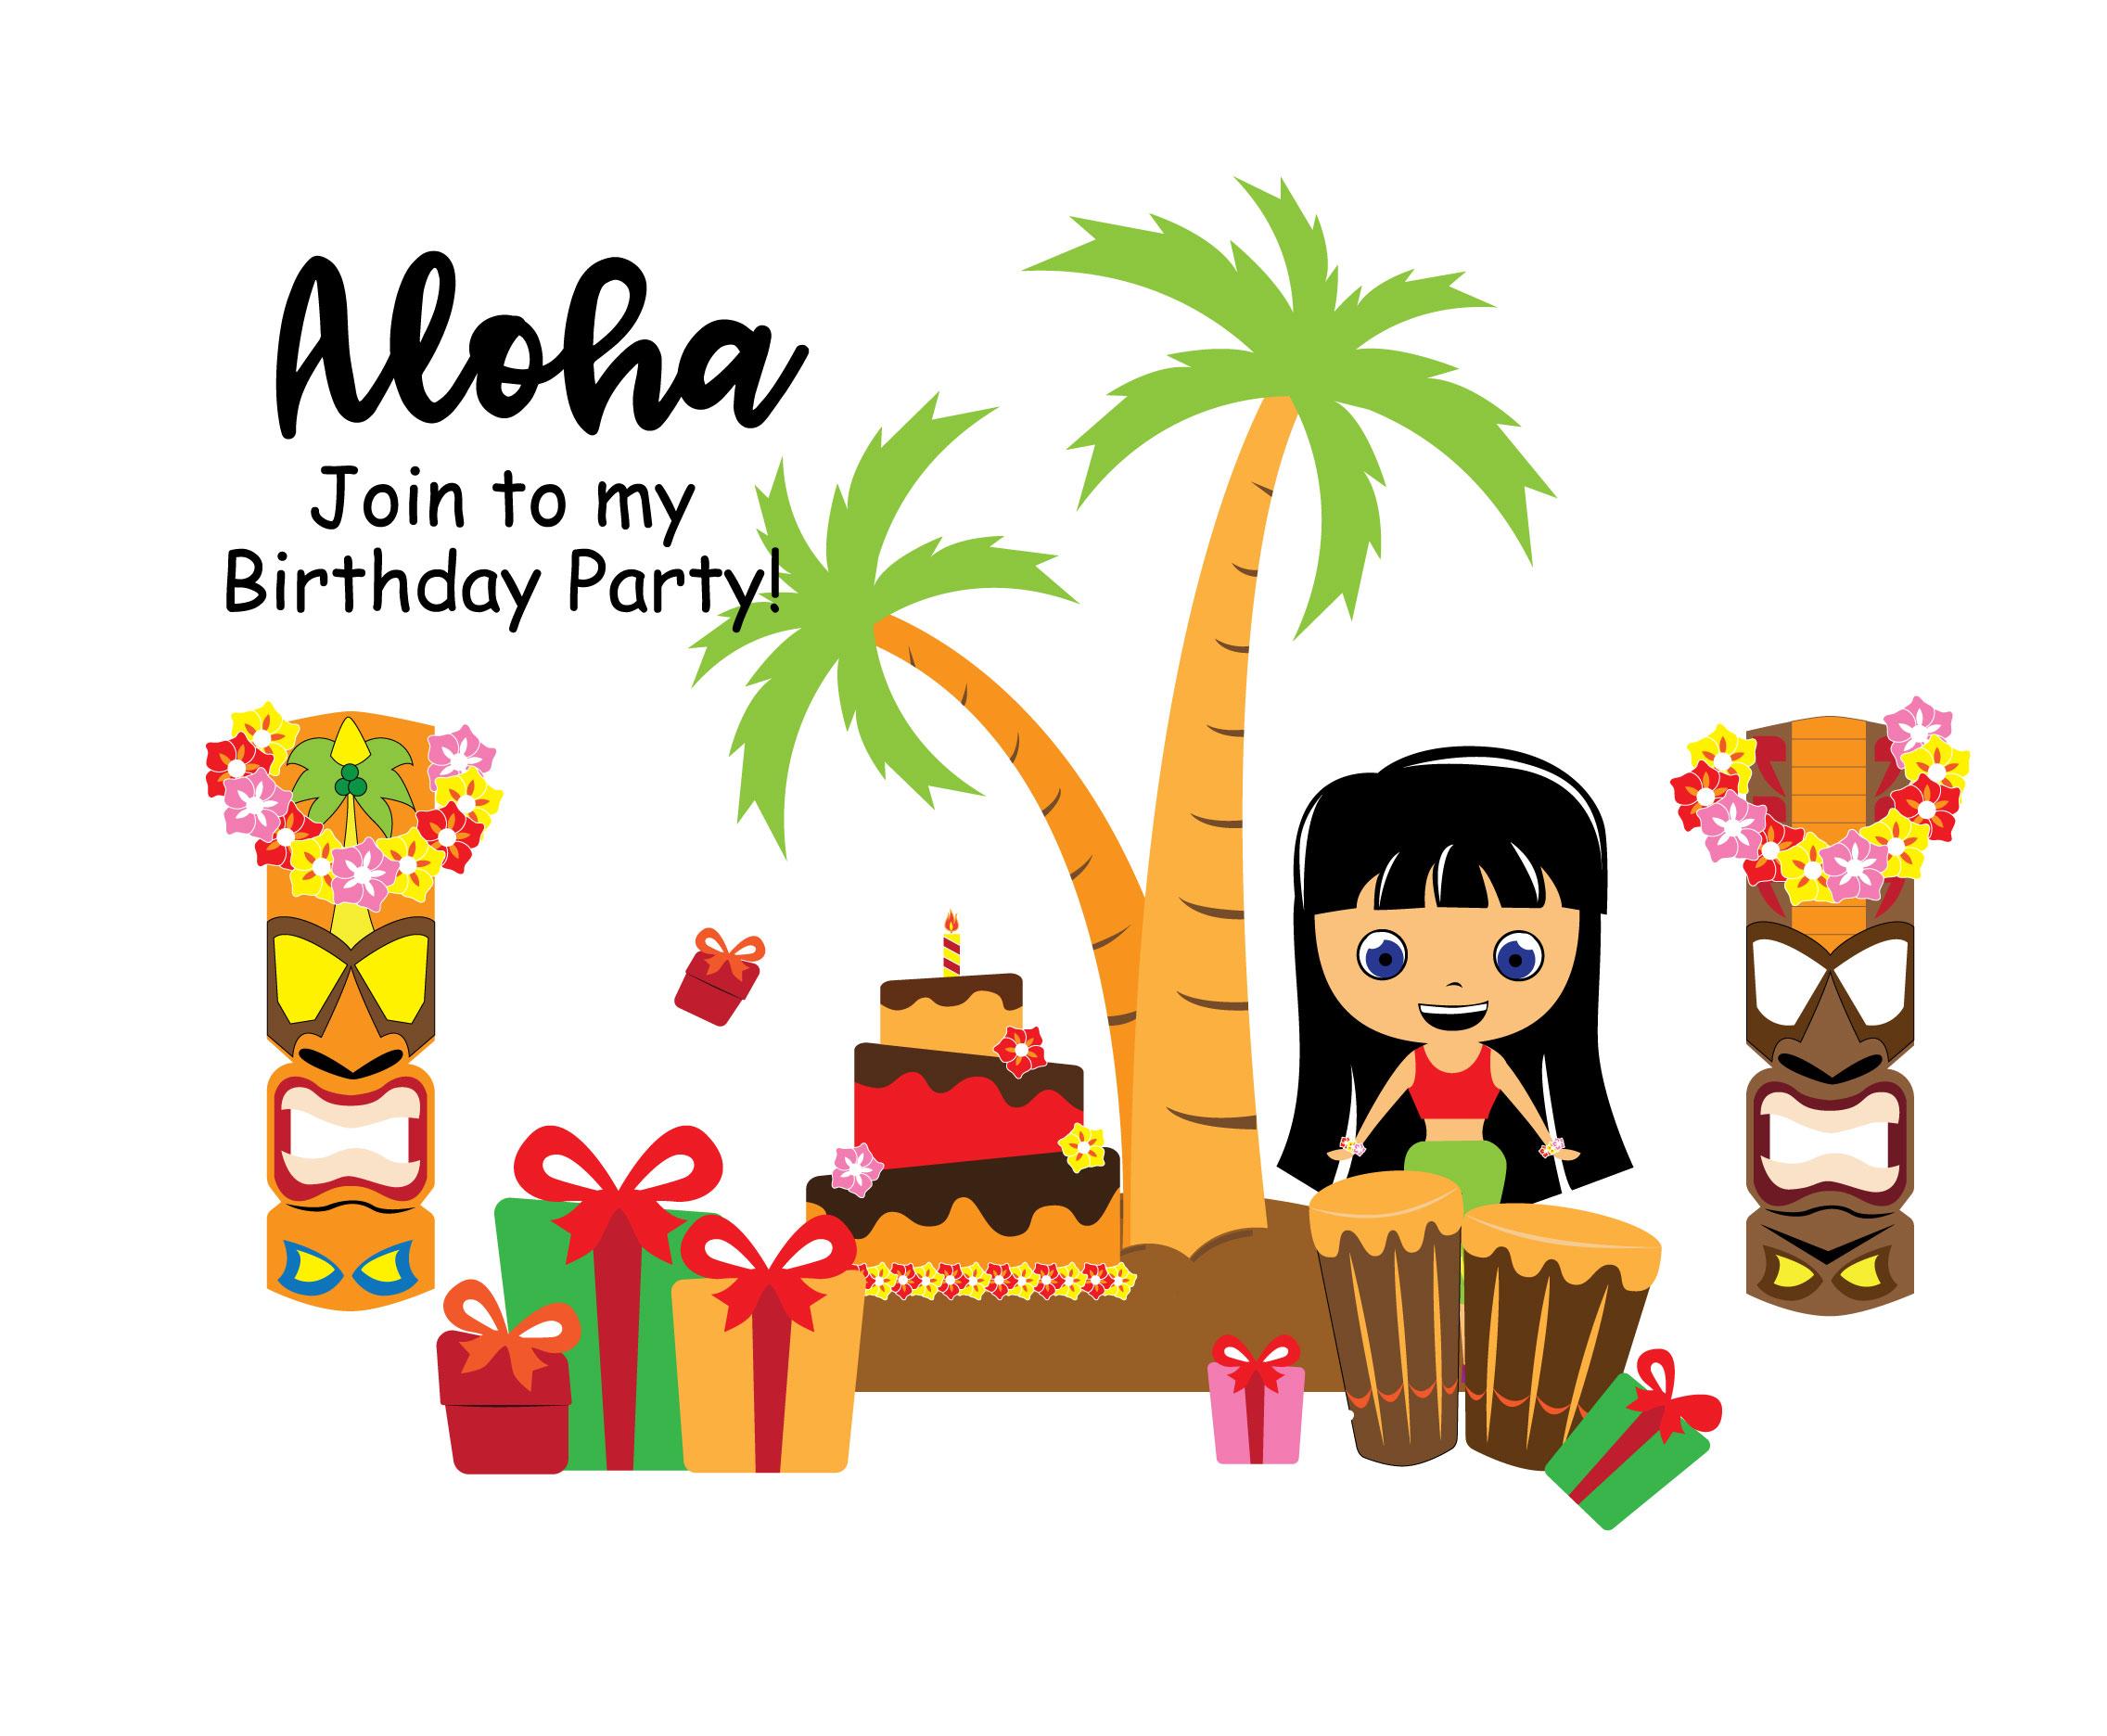 Aloha Geburtstag Einladung Vektor - Kostenlose Vektor-Kunst, Archiv ...